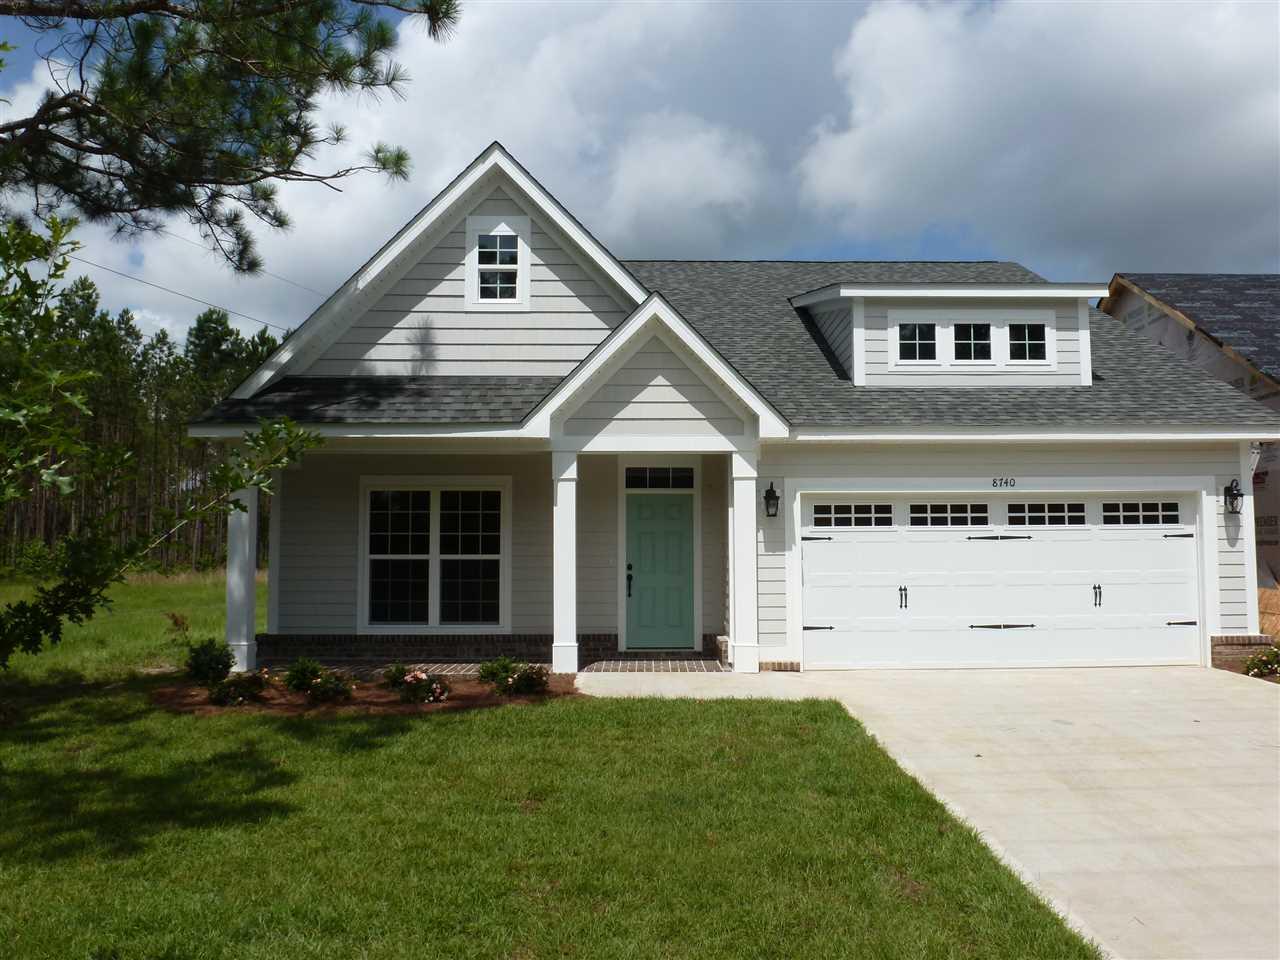 Property ID 308955